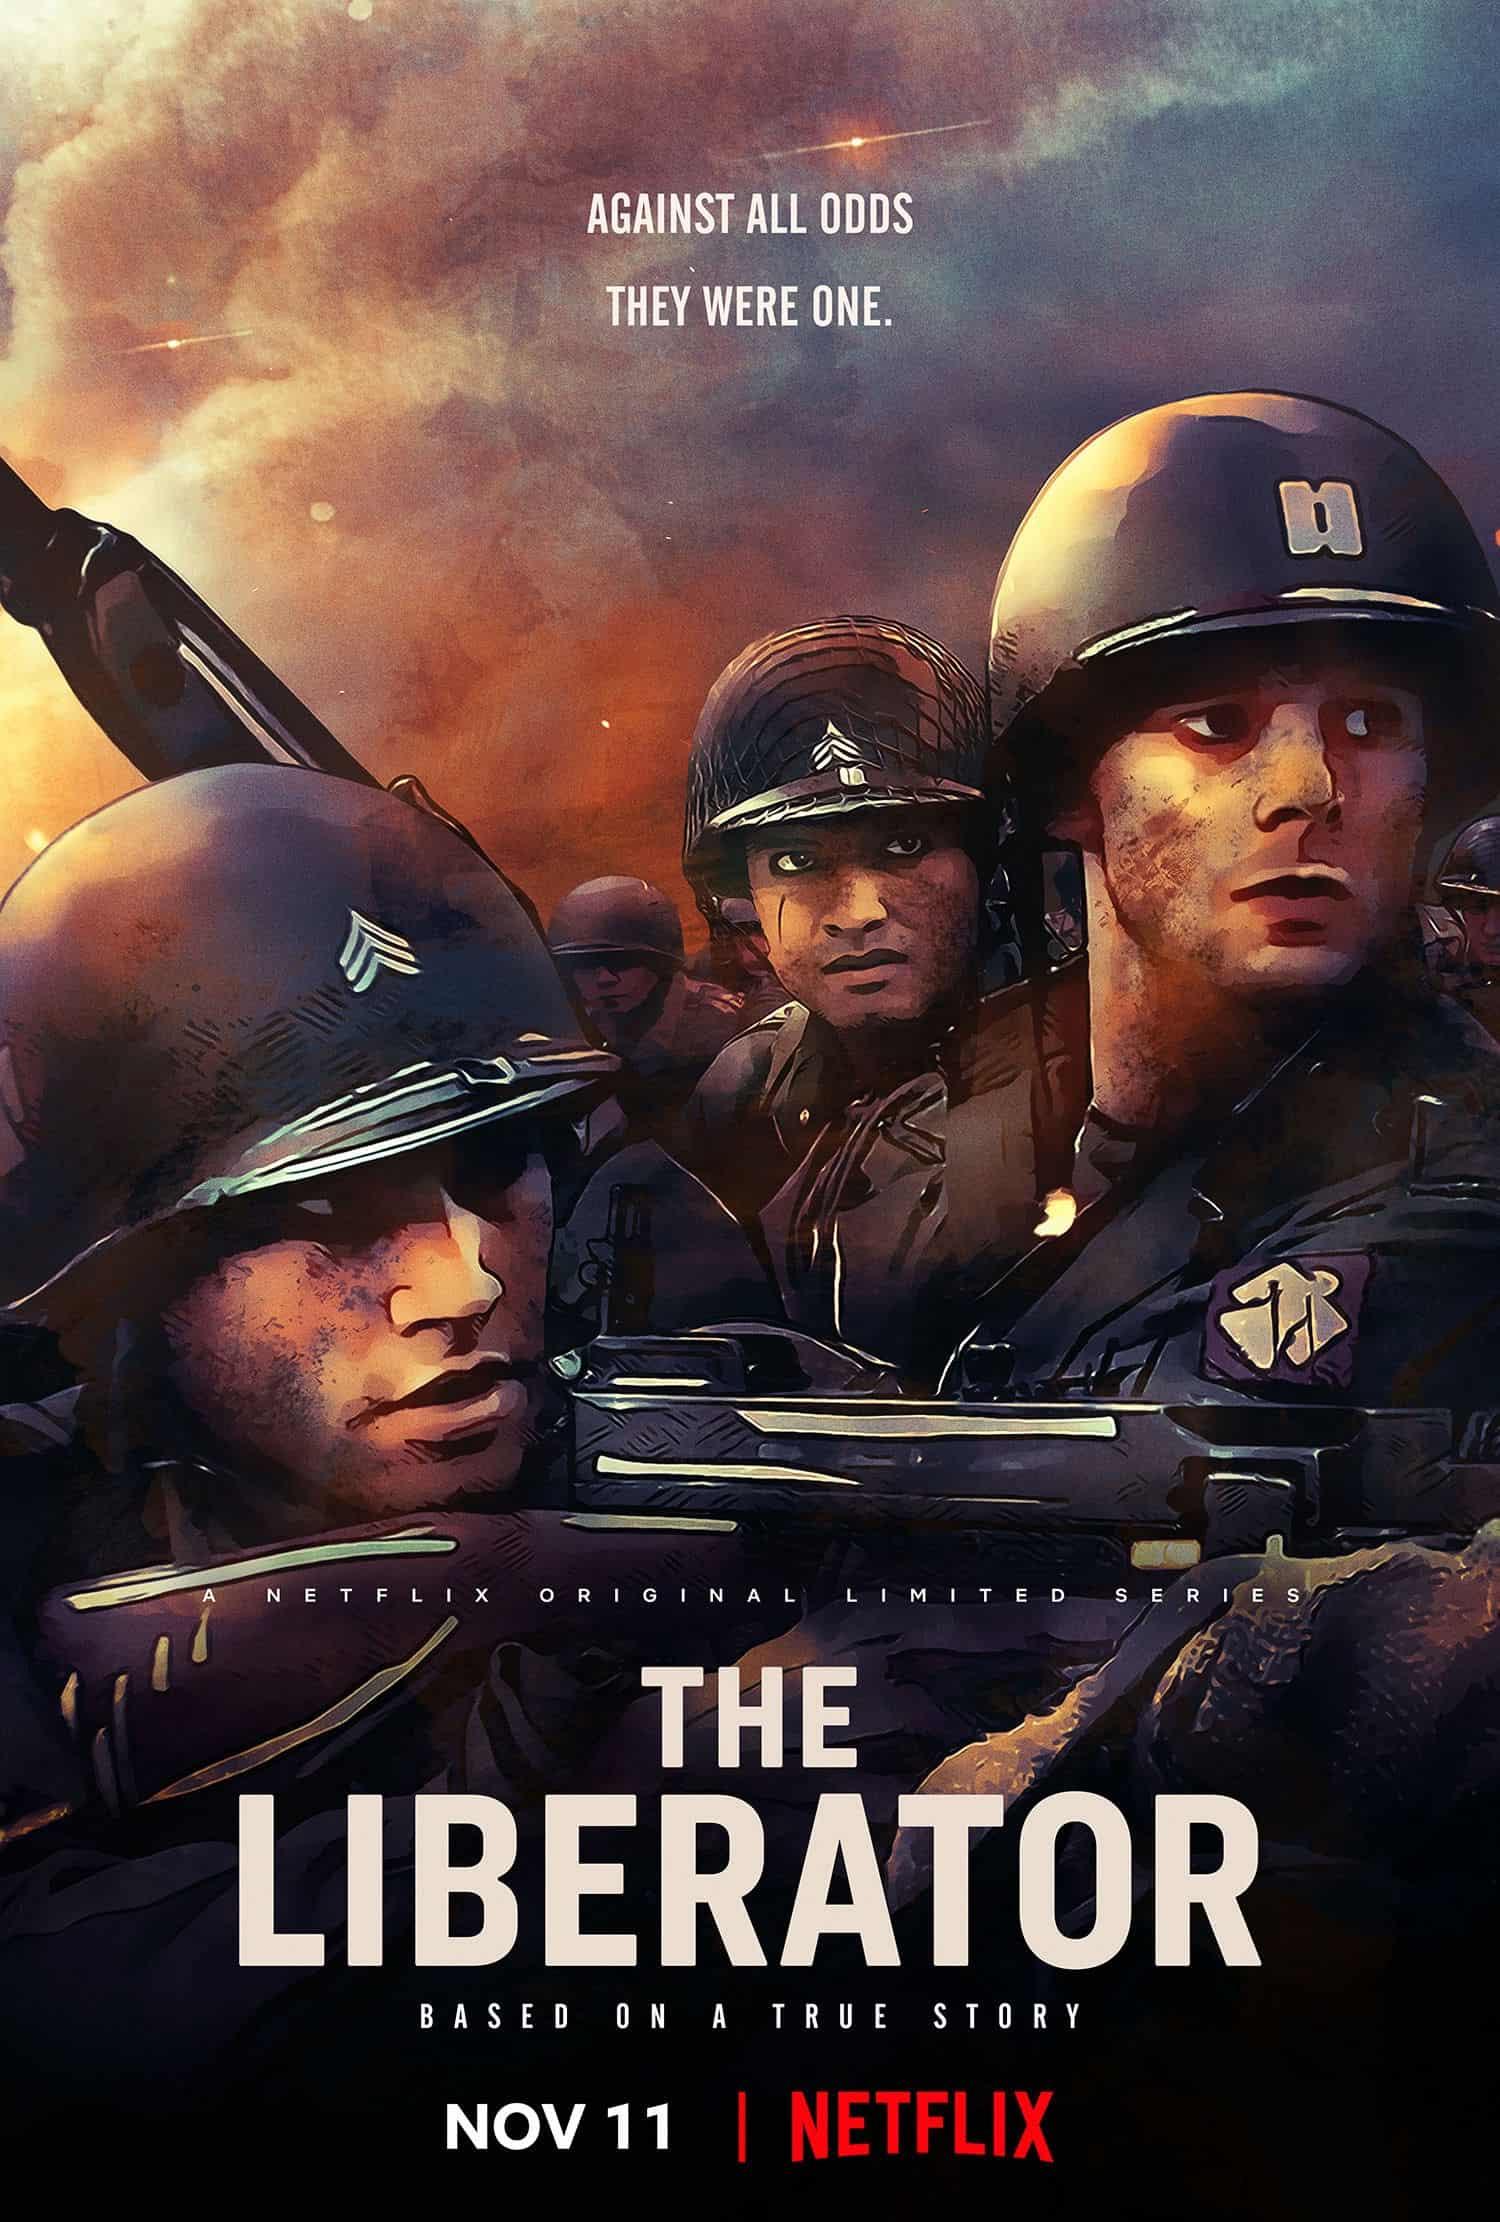 The Liberator Season 1 (2020) ผู้ปลดปล่อย ปี1 พากย์ไทย EP1 – EP4 [จบ]